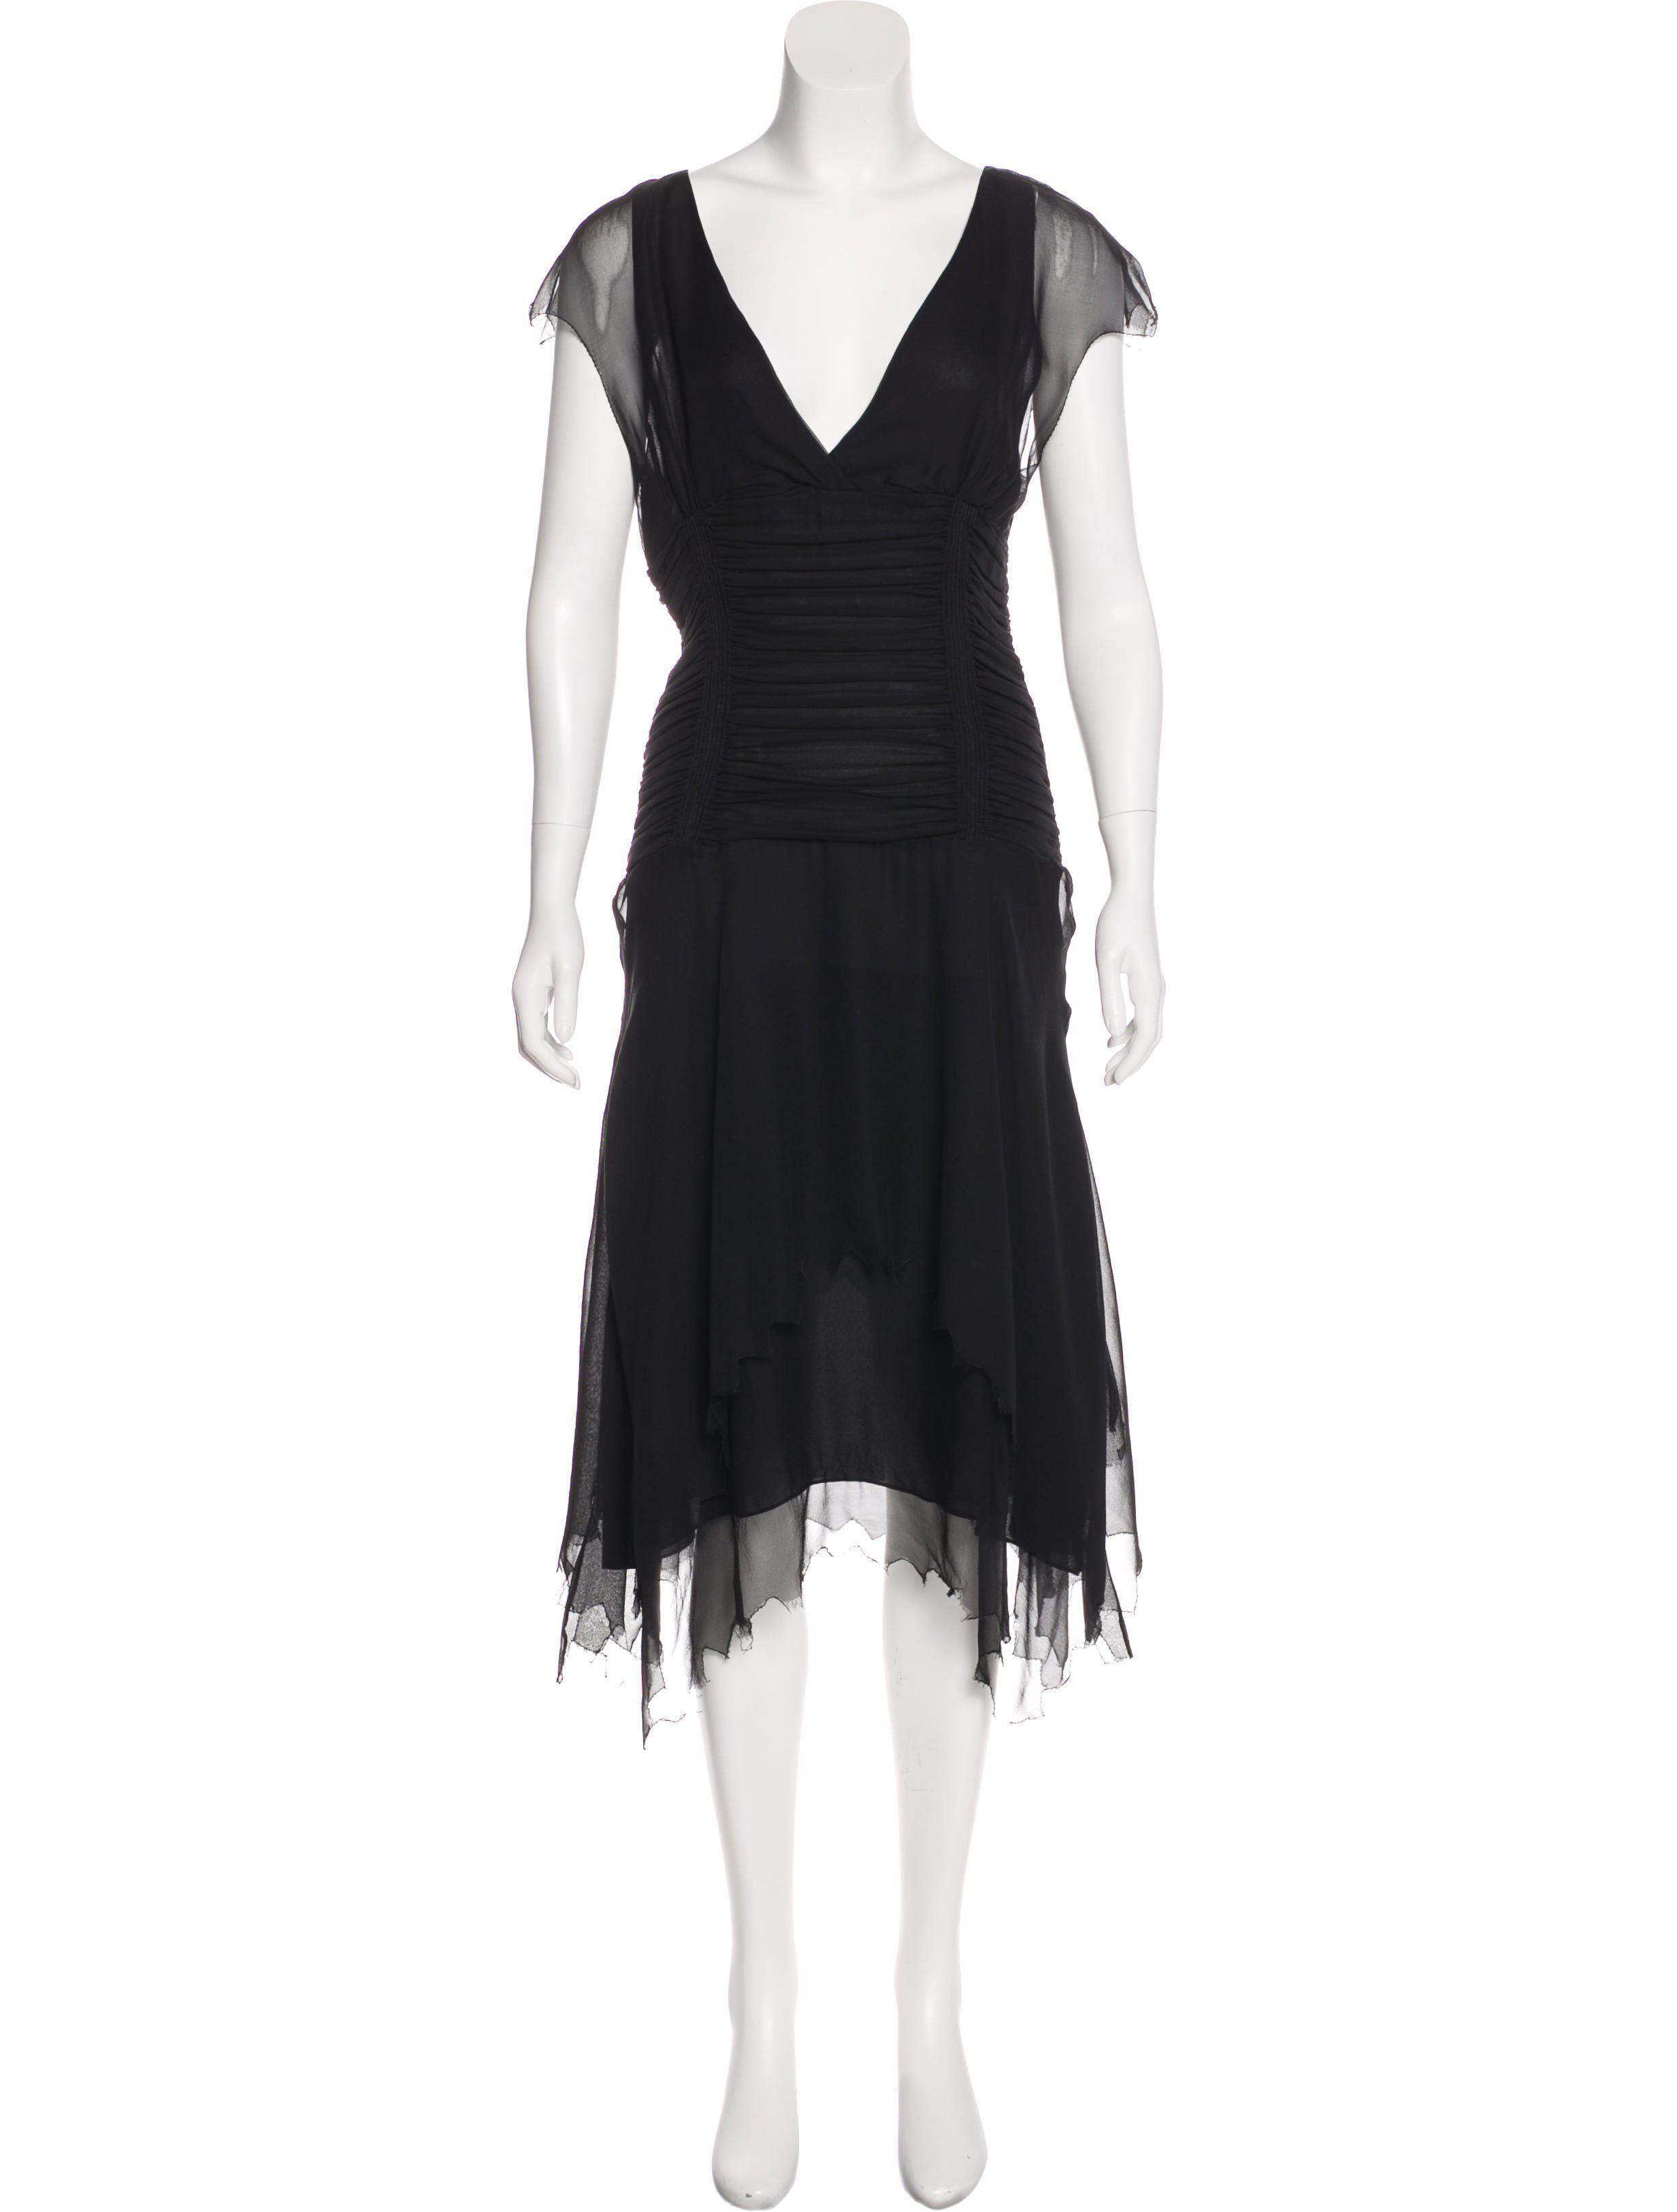 90146aa76b0 Lyst - Lela Rose Sleeveless Midi Dress in Black